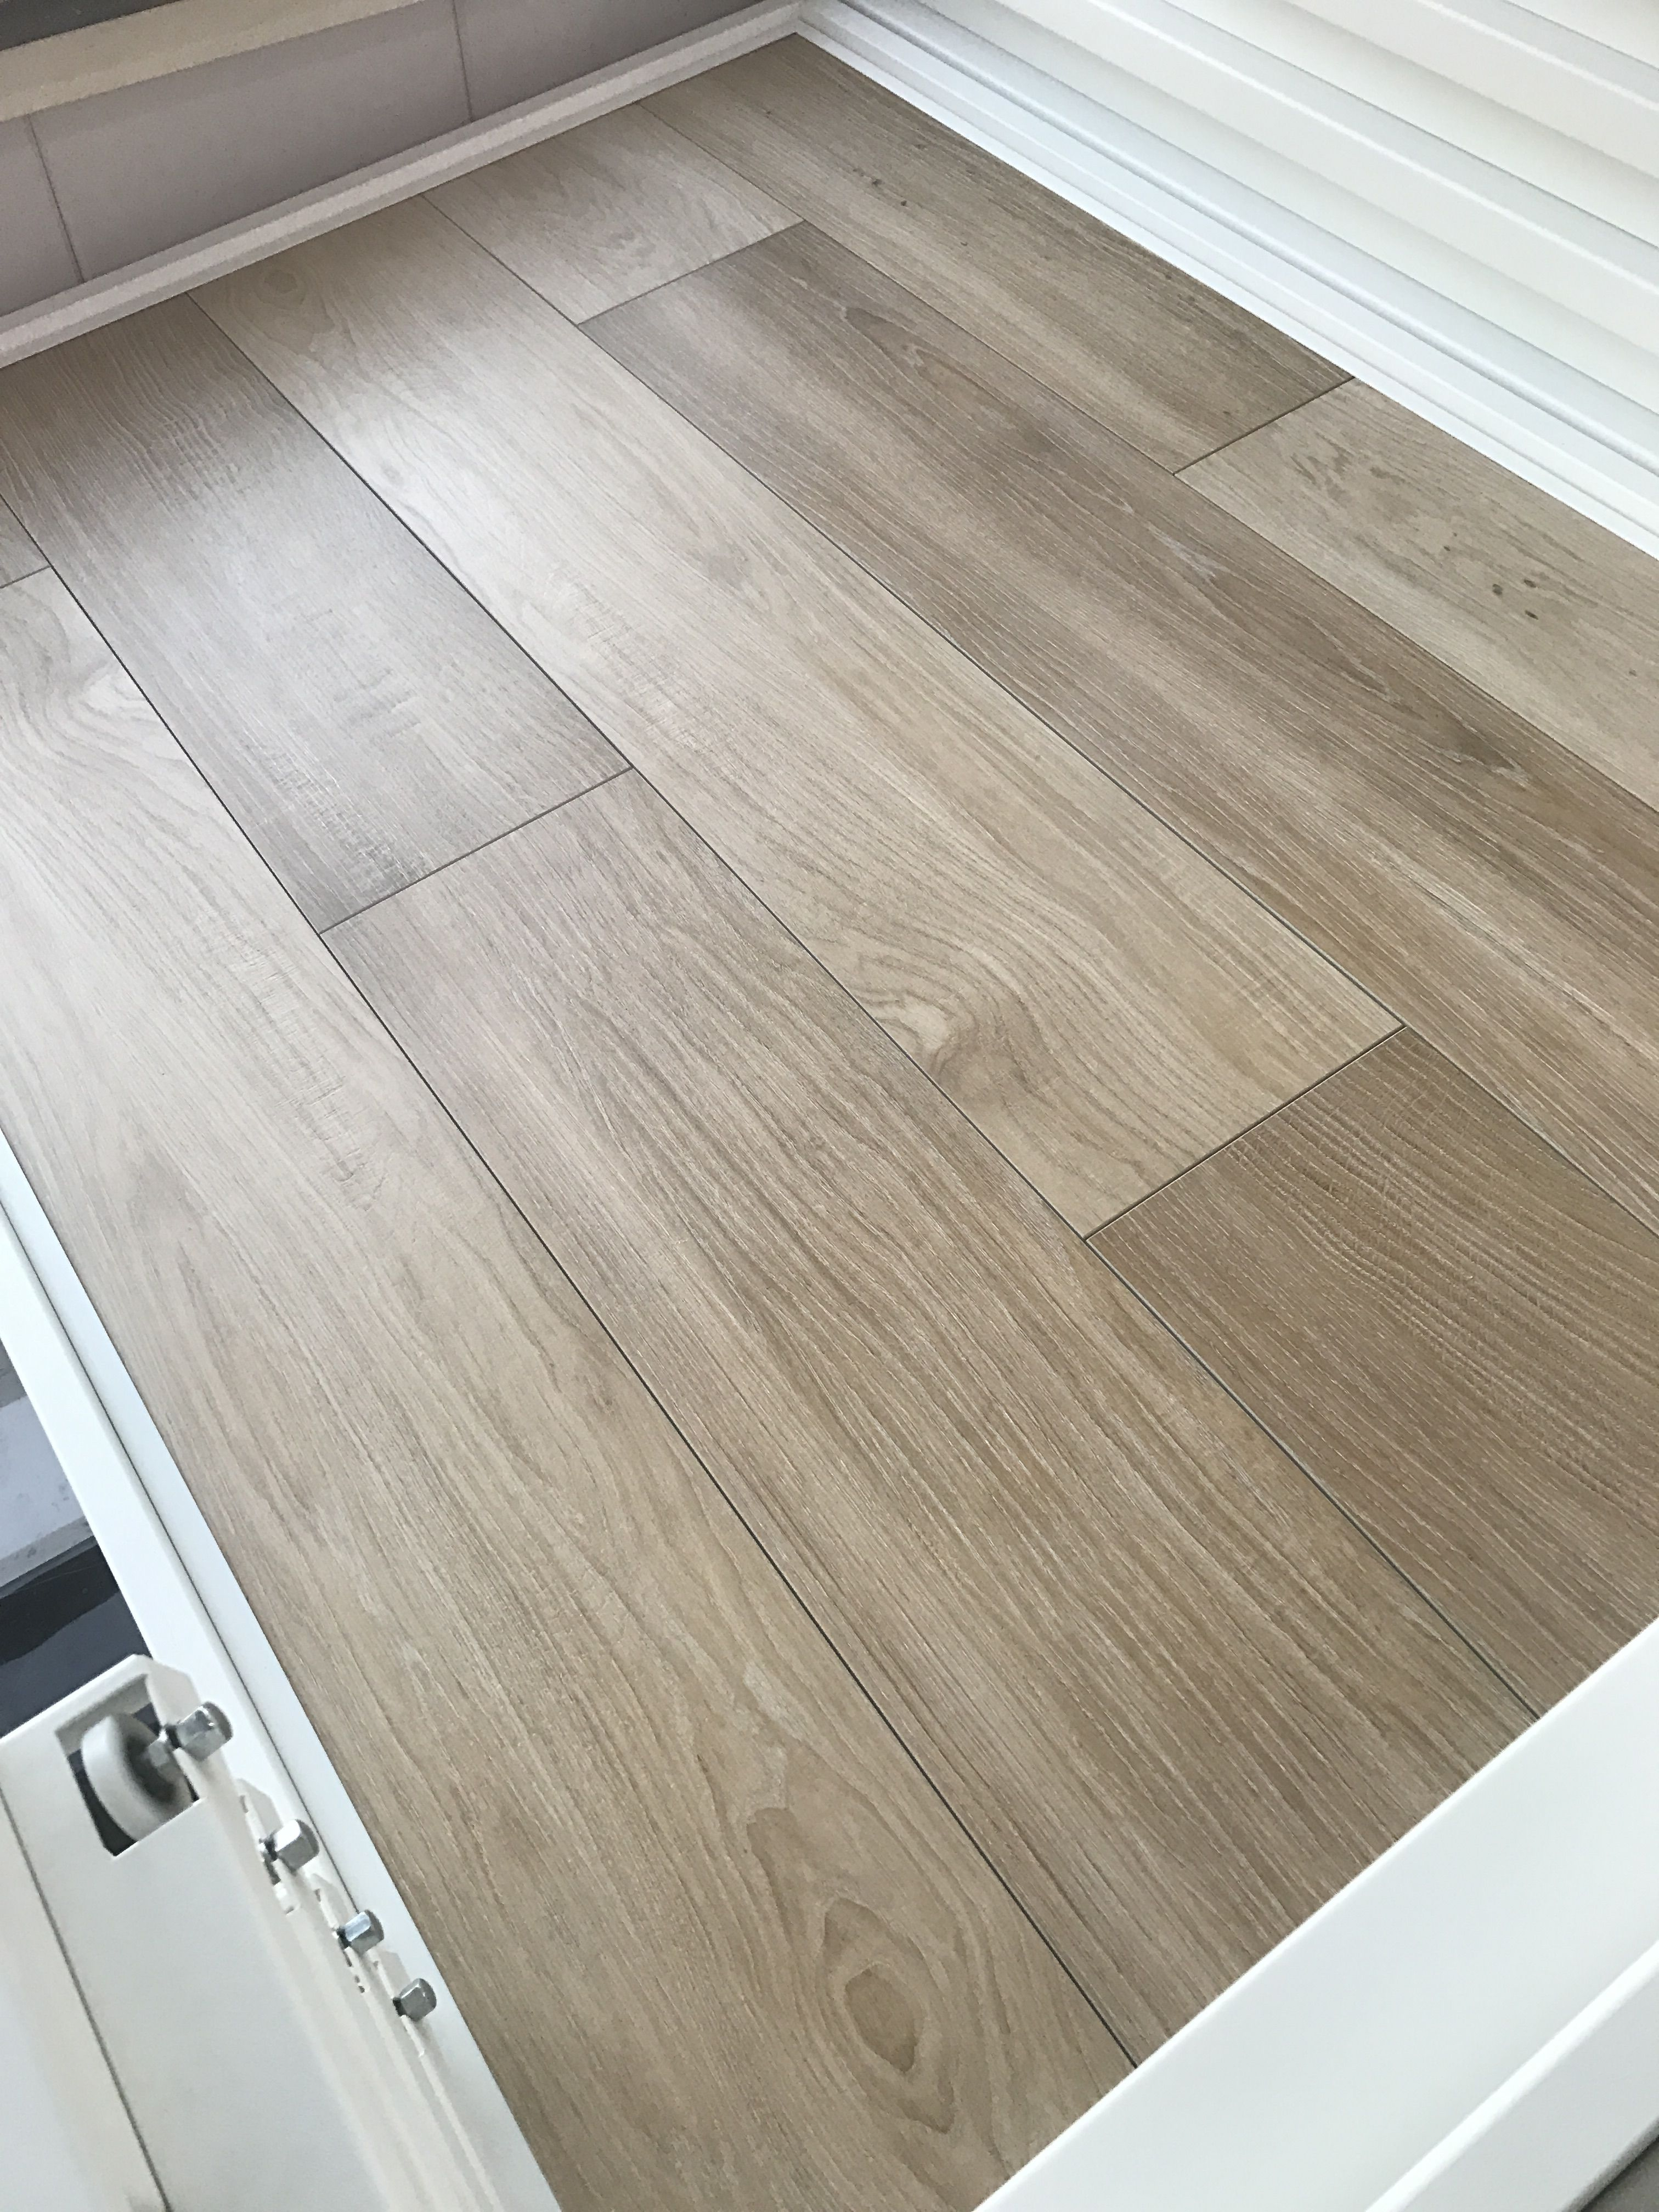 marazzi treverk must beige houtlook vloertegels 25x150 cm marazzi pinterest. Black Bedroom Furniture Sets. Home Design Ideas